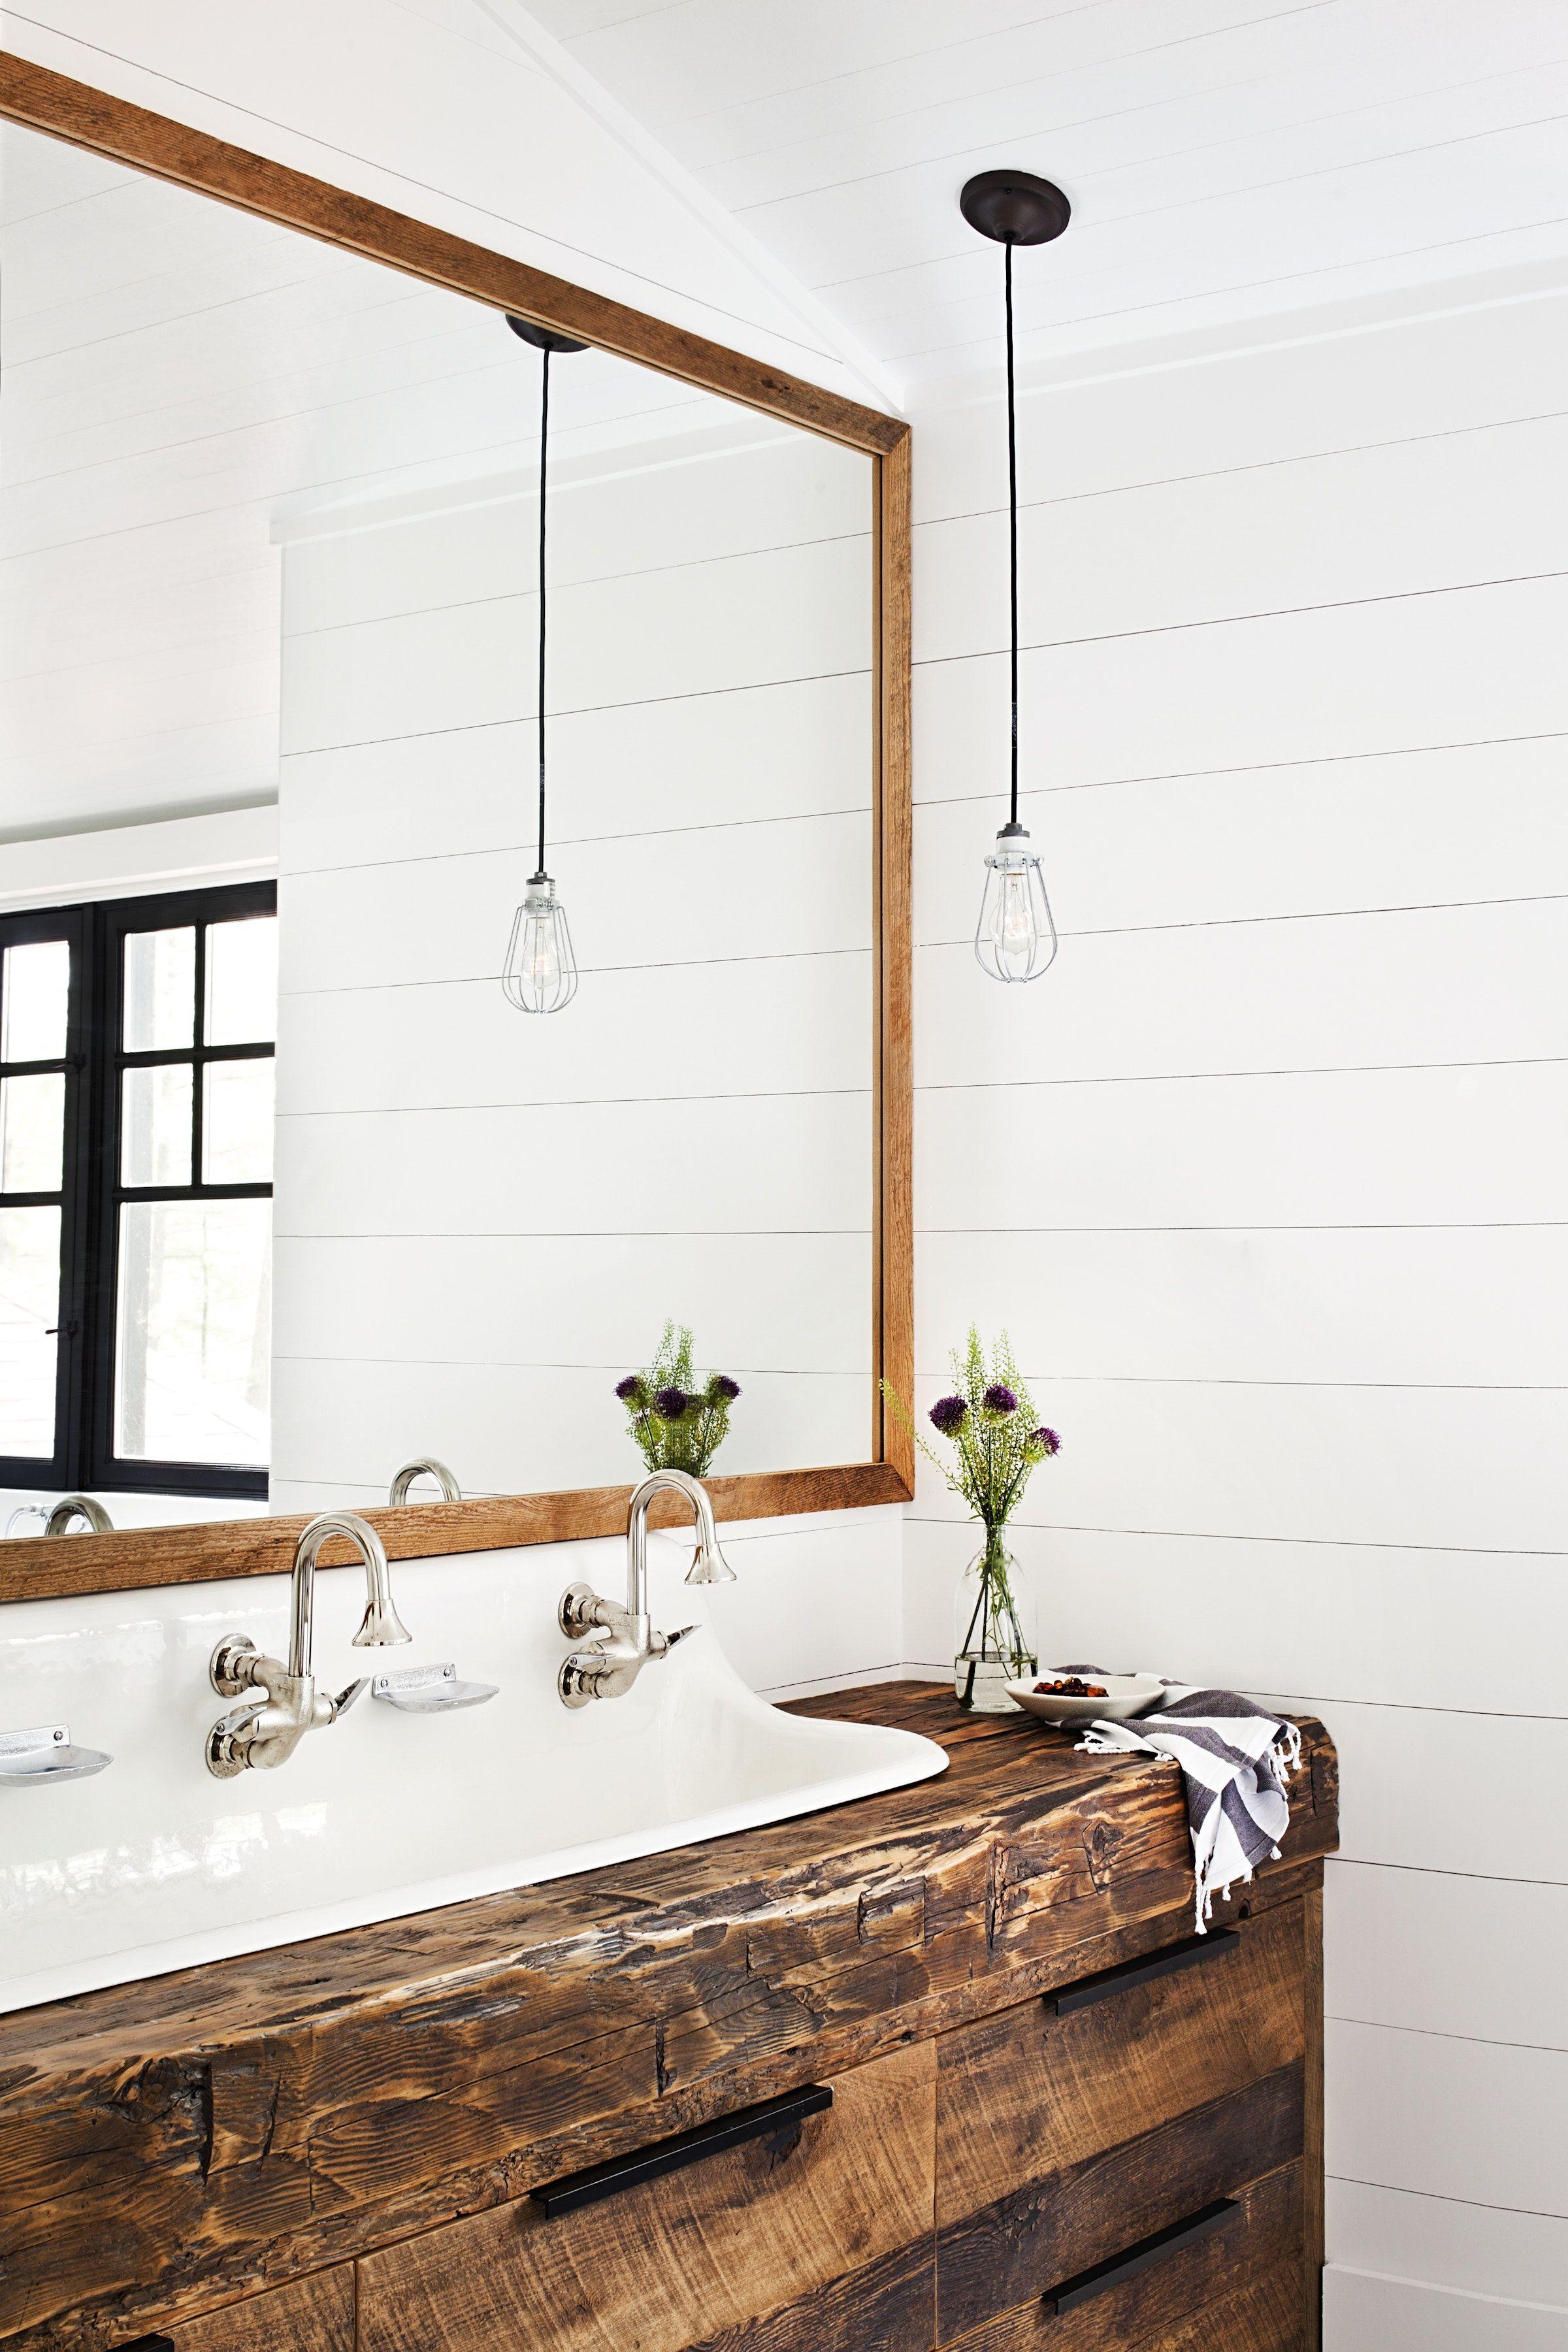 Muskoka Cottage - Bathroom   Rustic/Barn   Pinterest   Trough sink ...